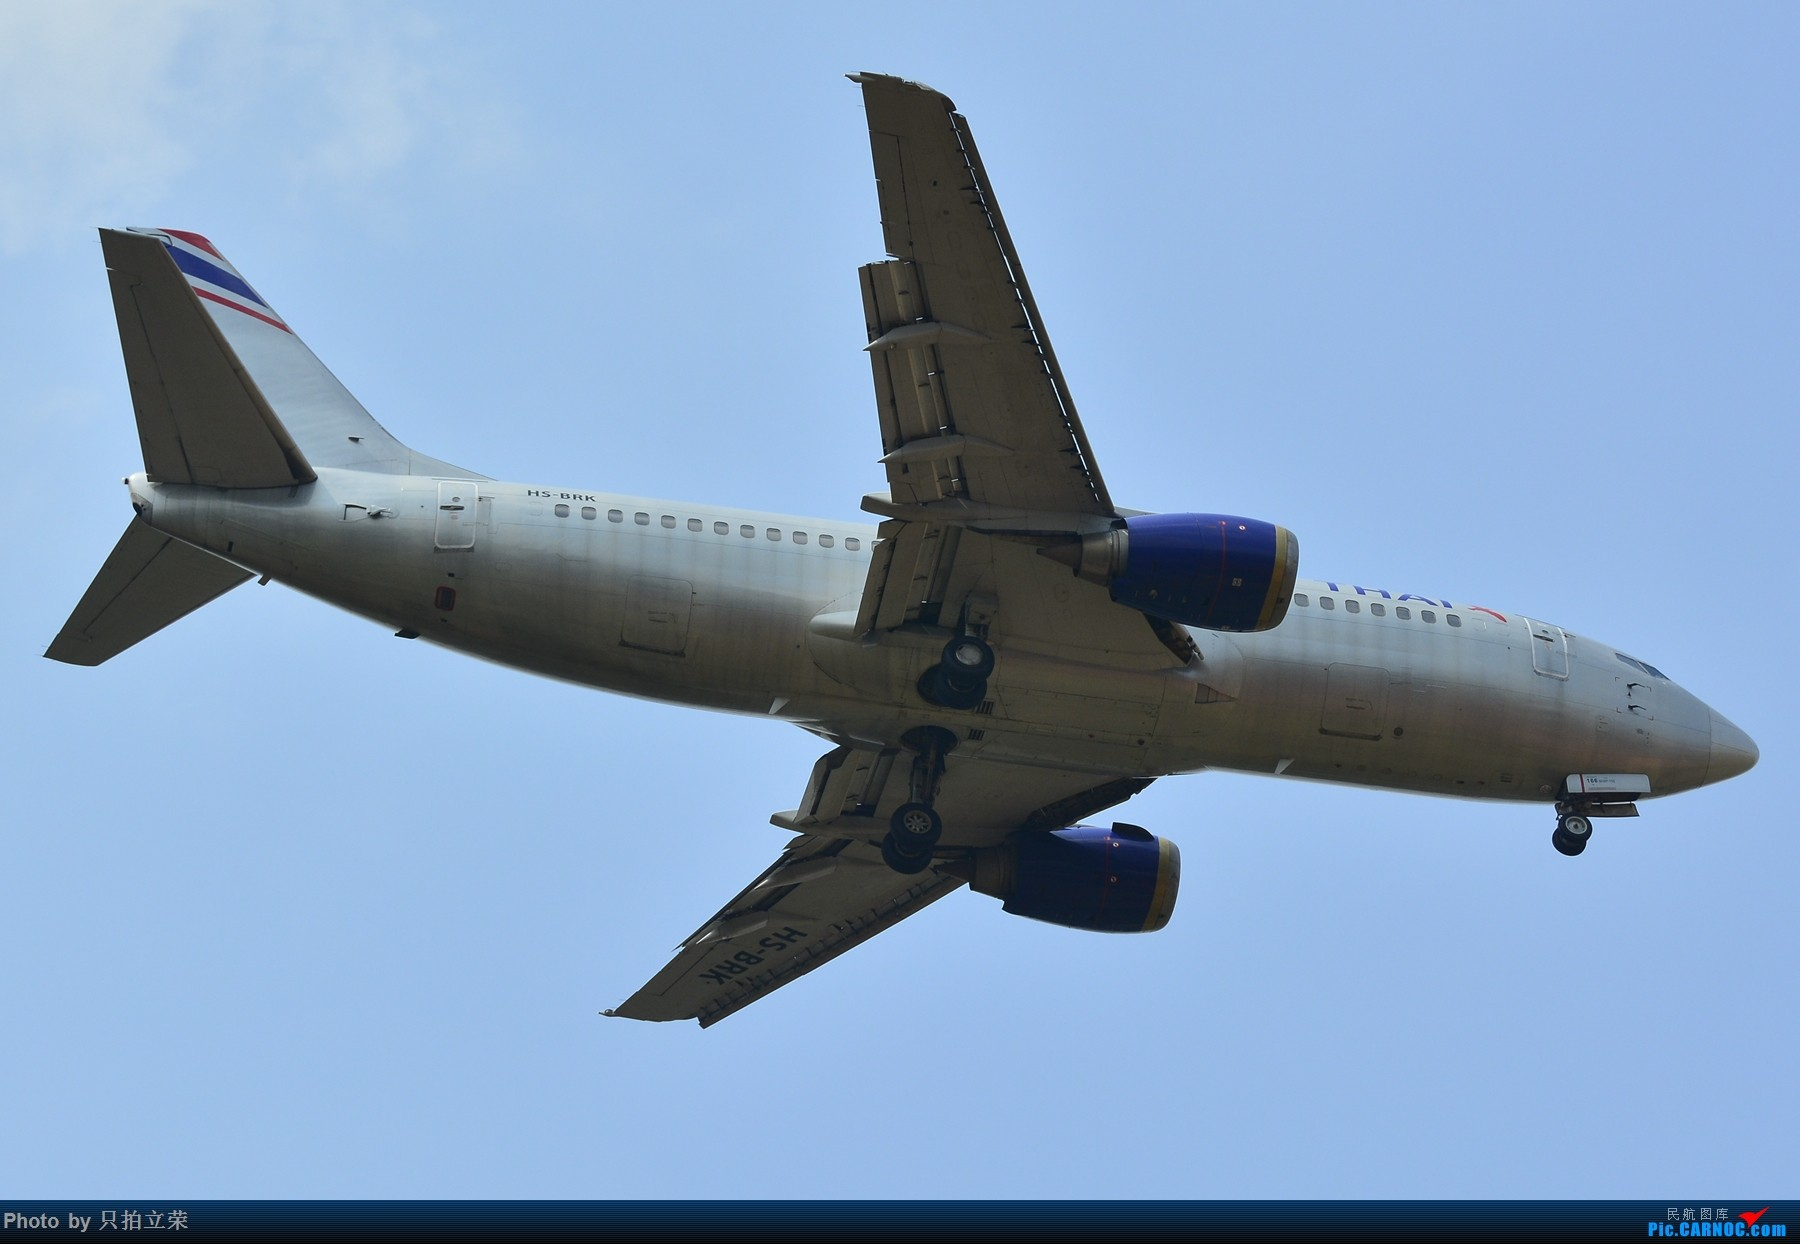 Re:[原创]湖南飞友会之10月9日长沙黄花好货满天飞! BOEING 737-300  中国长沙黄花国际机场